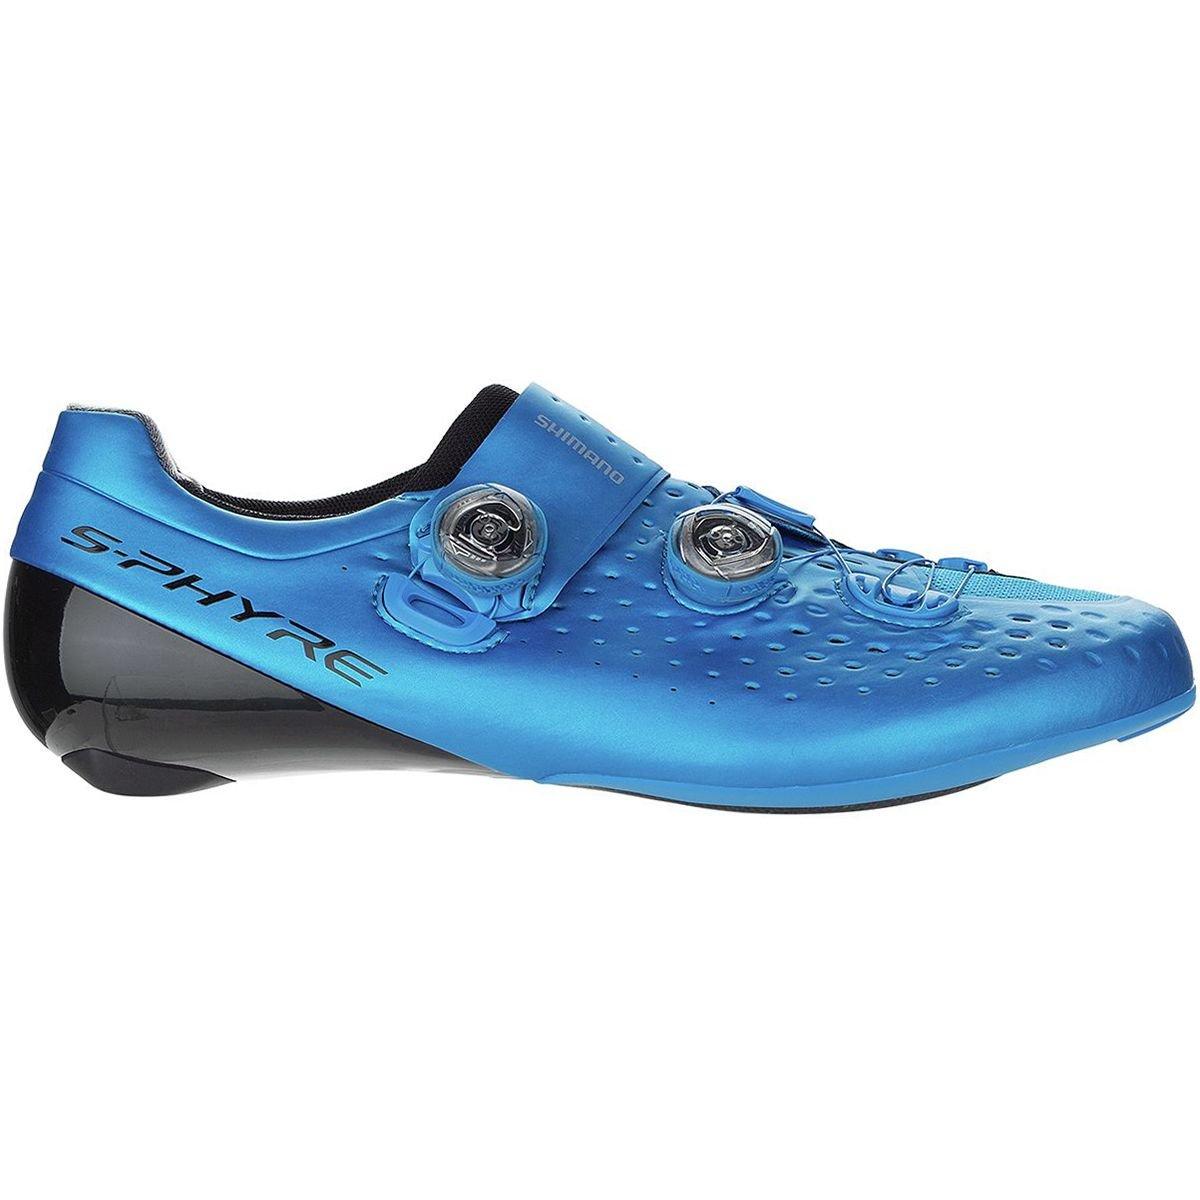 Shimano sh-rc9 s-phyre自転車Shoe – Men 'sブルー、42.0 B079DXDY39